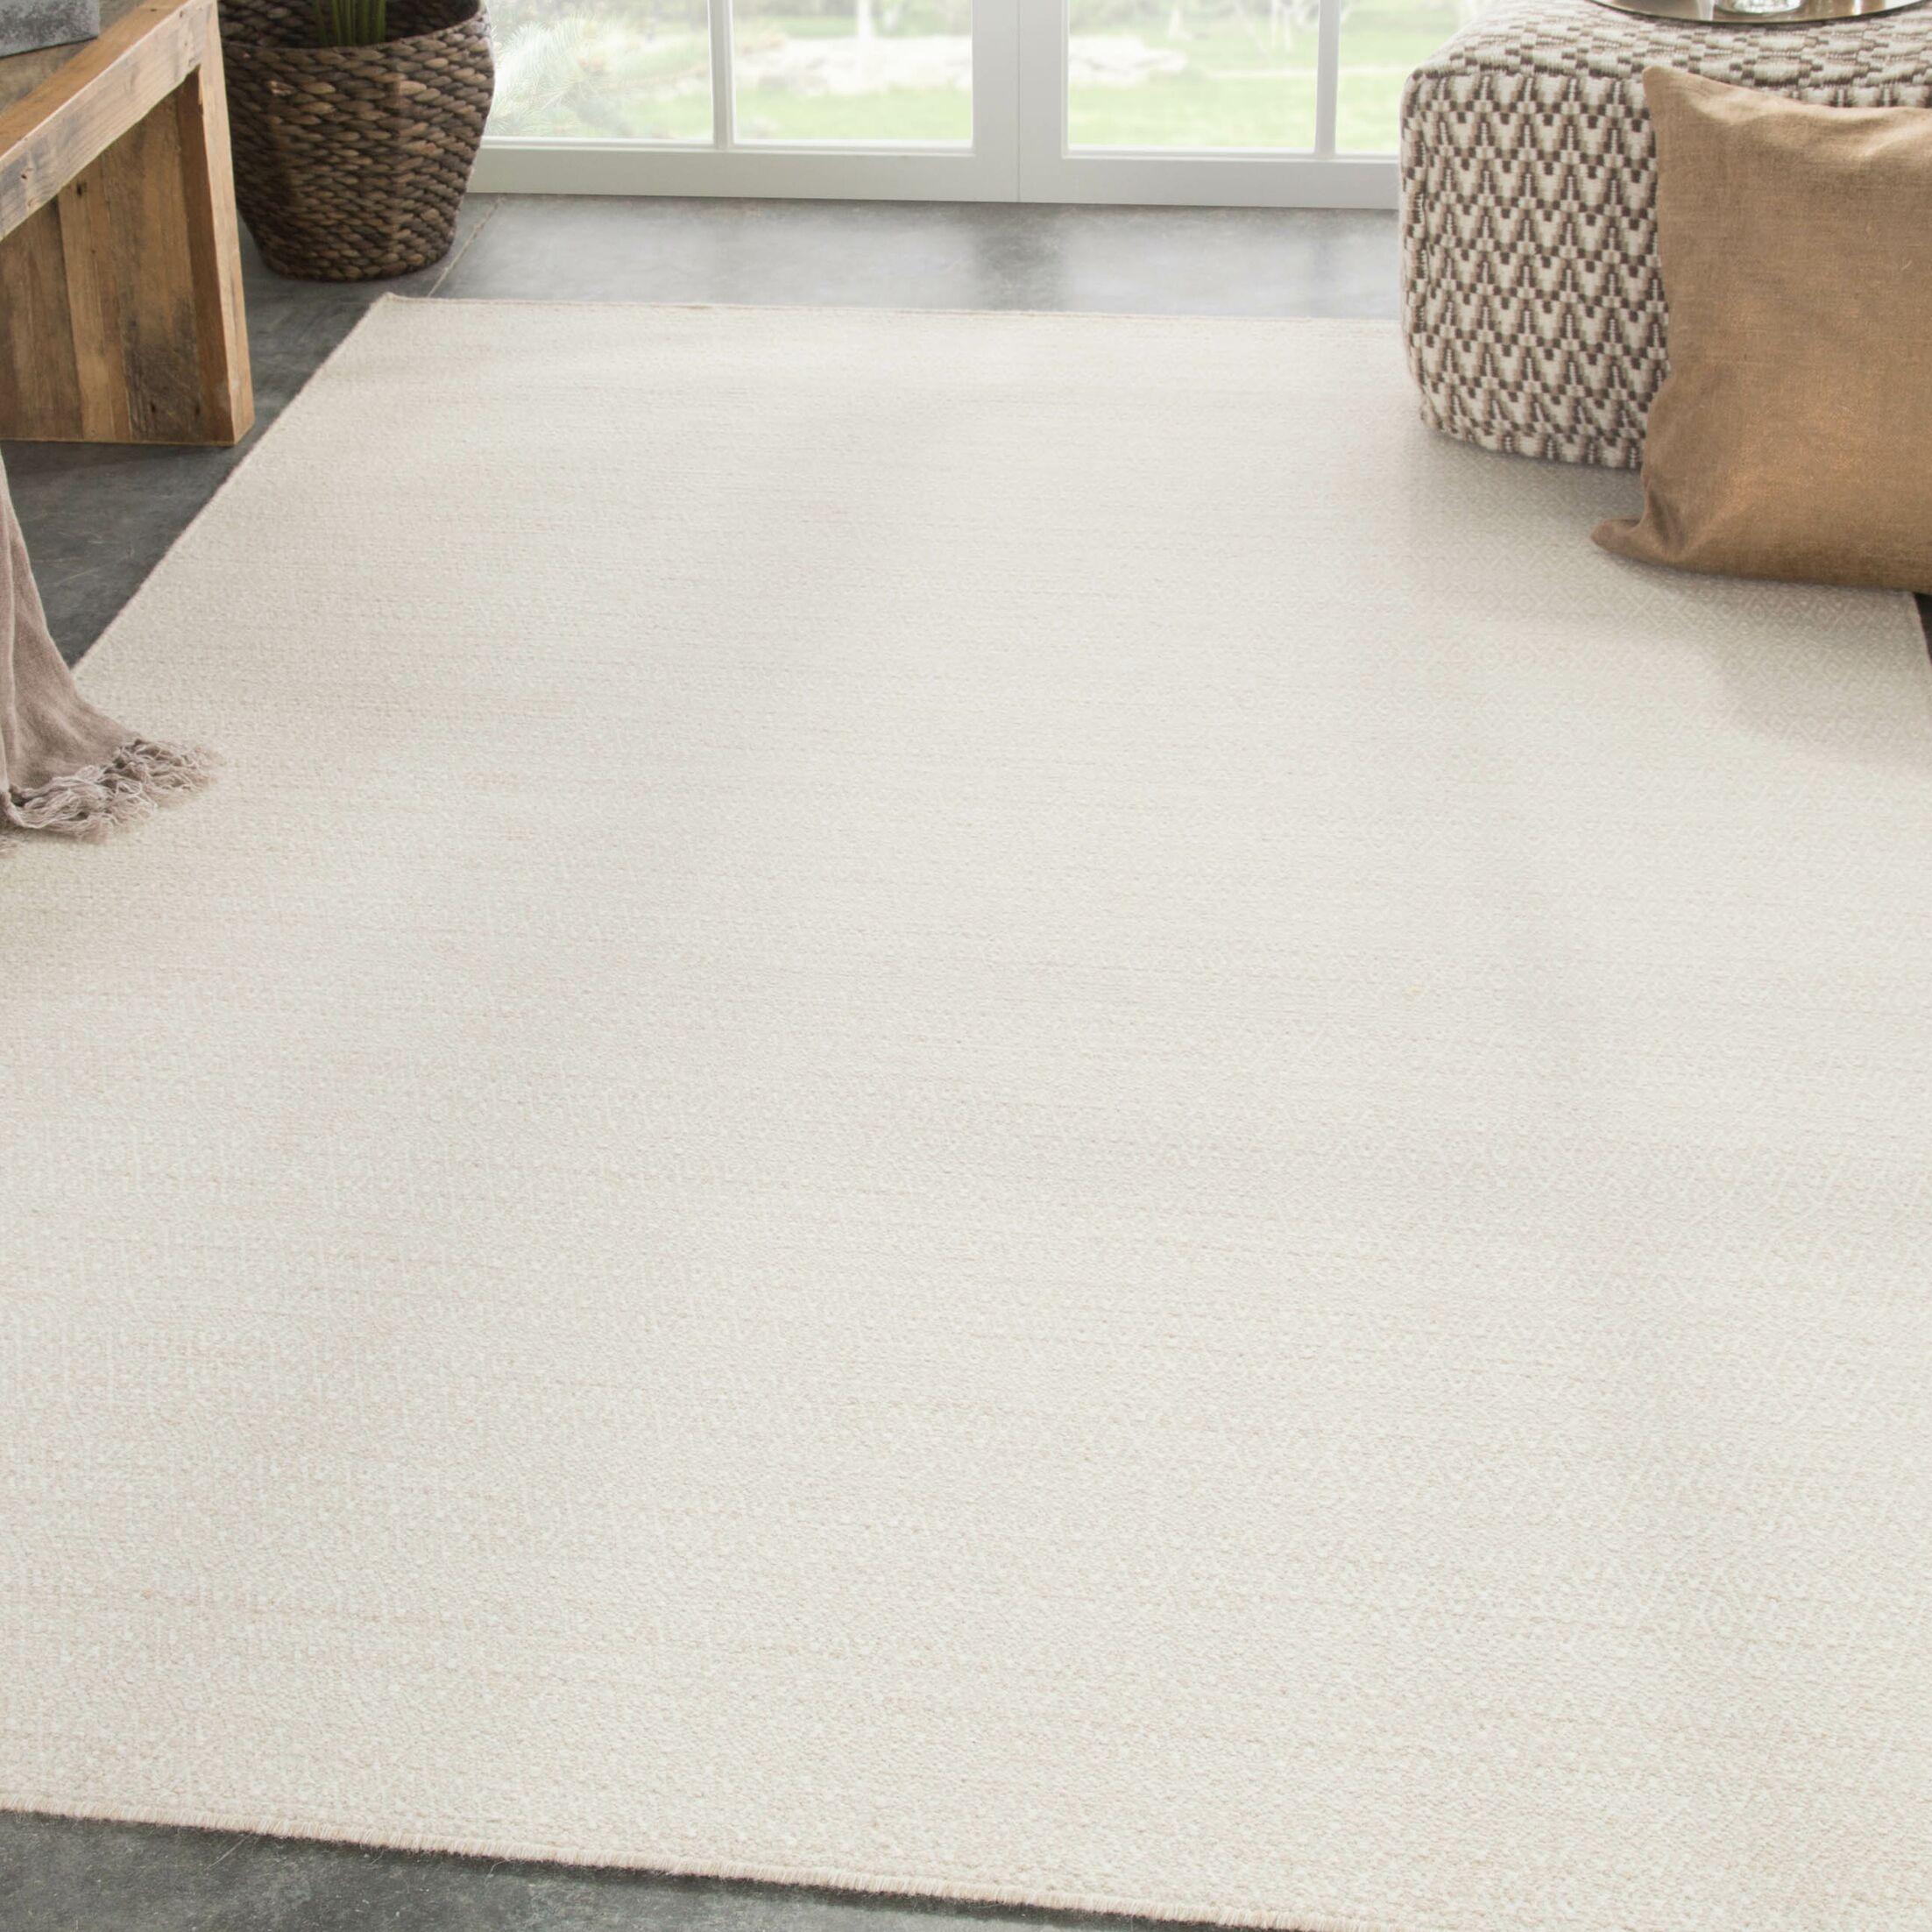 Finnerty Handmade Wool Ivory Area Rug Rug Size: Rectangle 8' x 10'